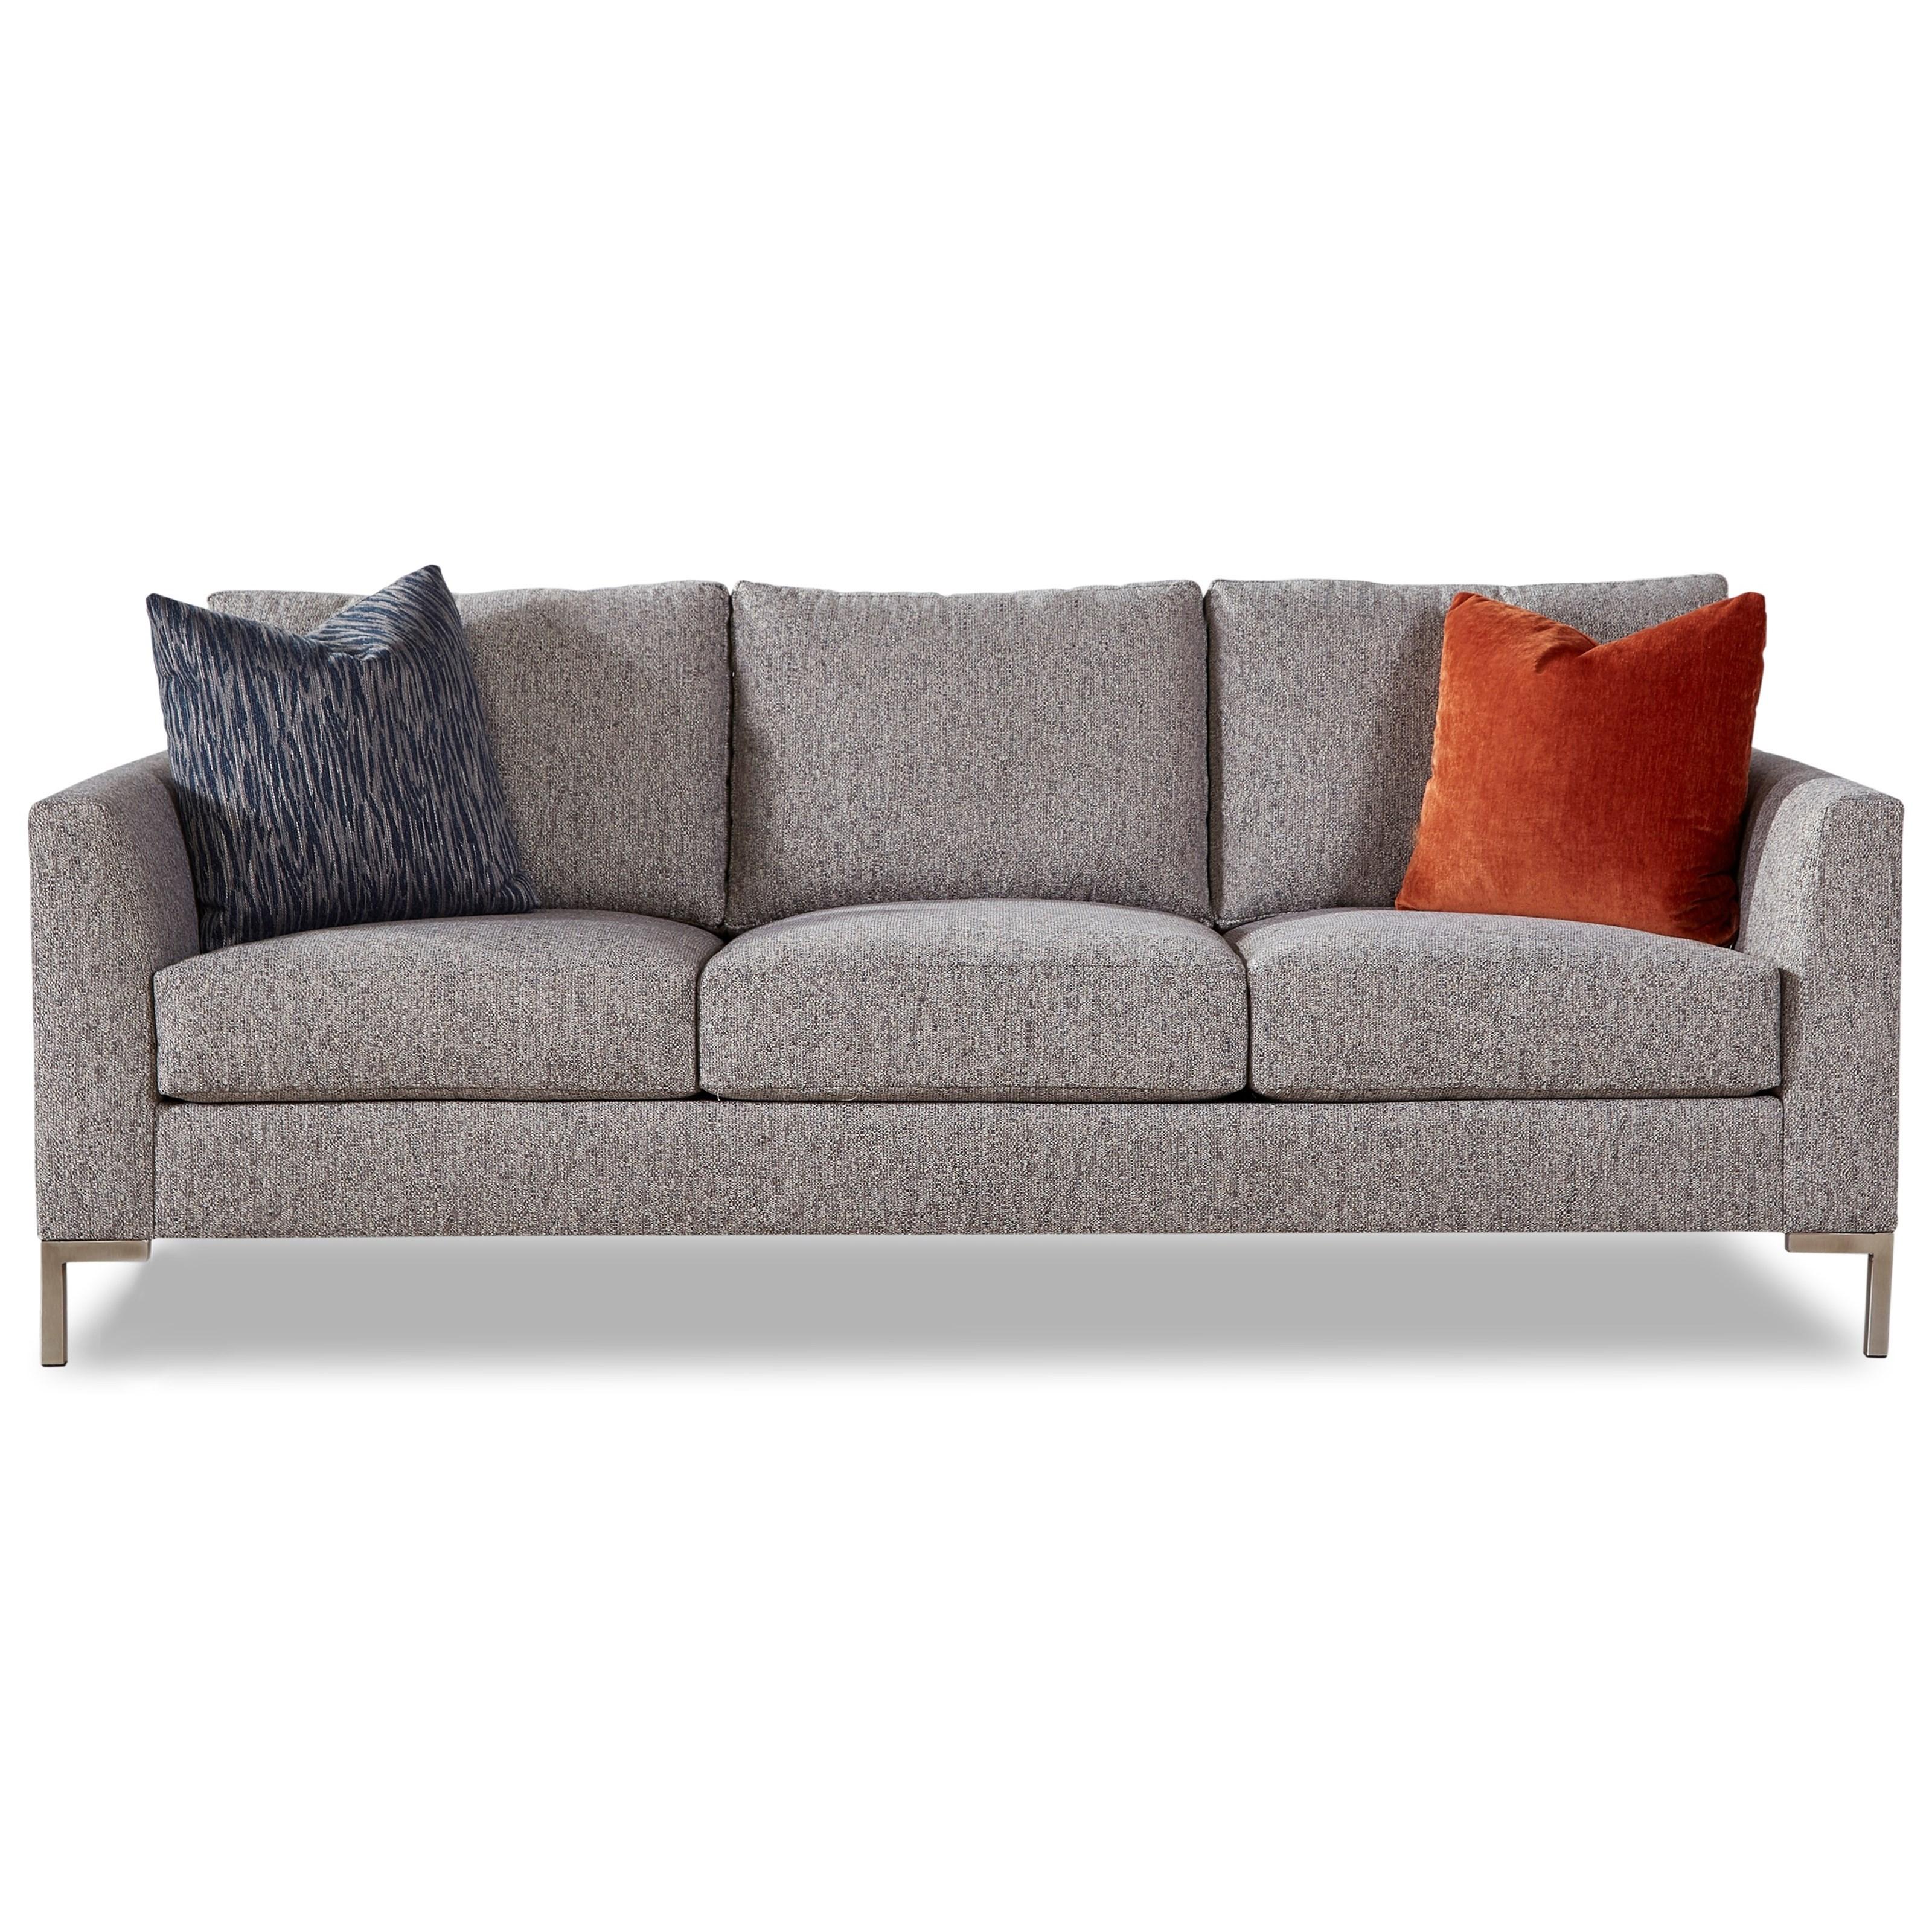 8014 Sofa by Geoffrey Alexander at Sprintz Furniture